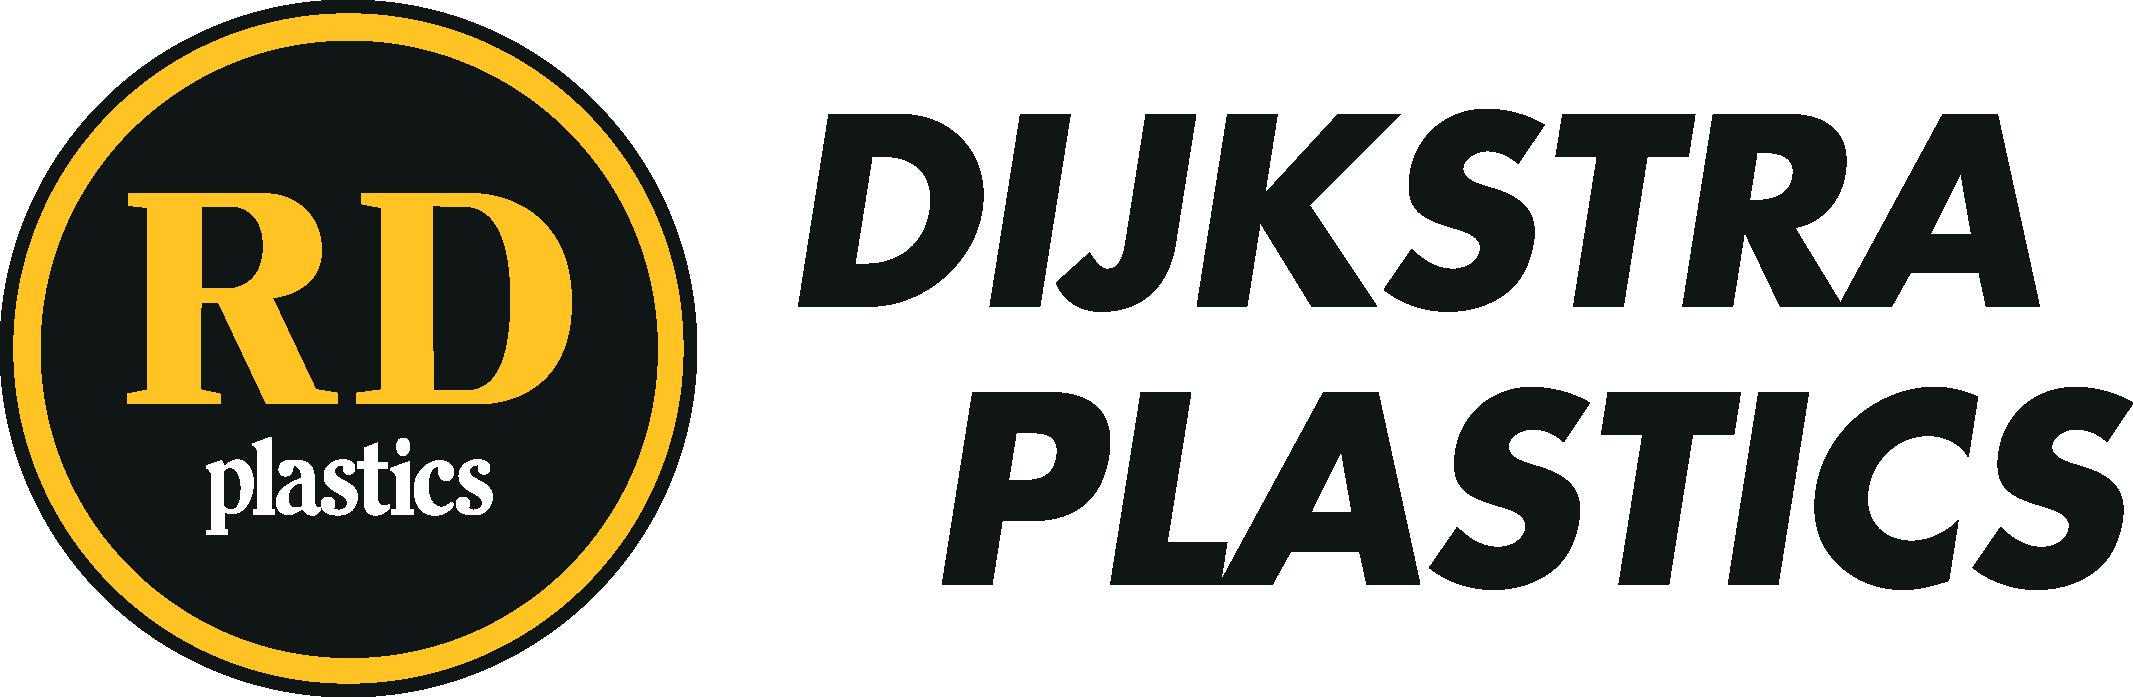 https://europeanplasticspact.org/wp-content/uploads/2021/05/dijkstra-plastics_logo.png